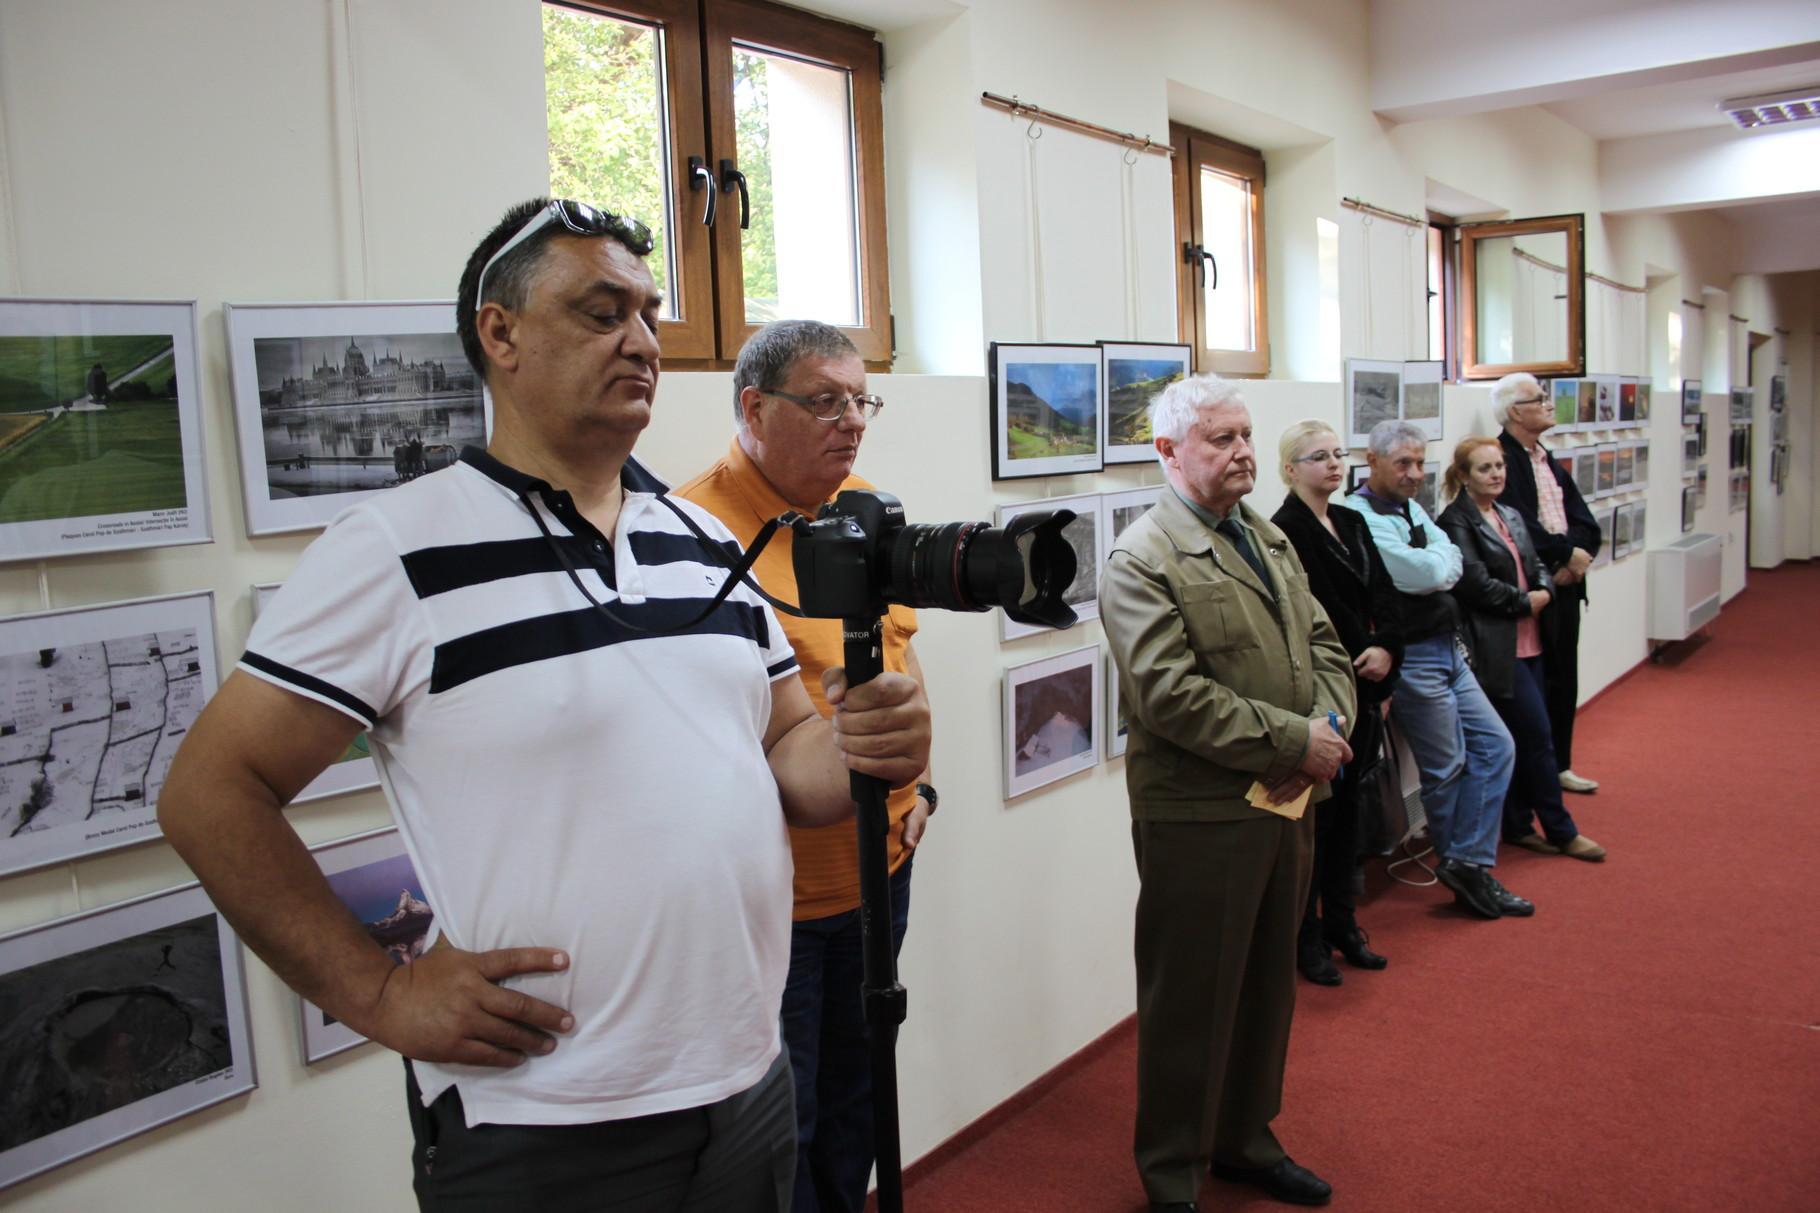 Fotó: Paladean Vasile - Csernyovitz (UA)